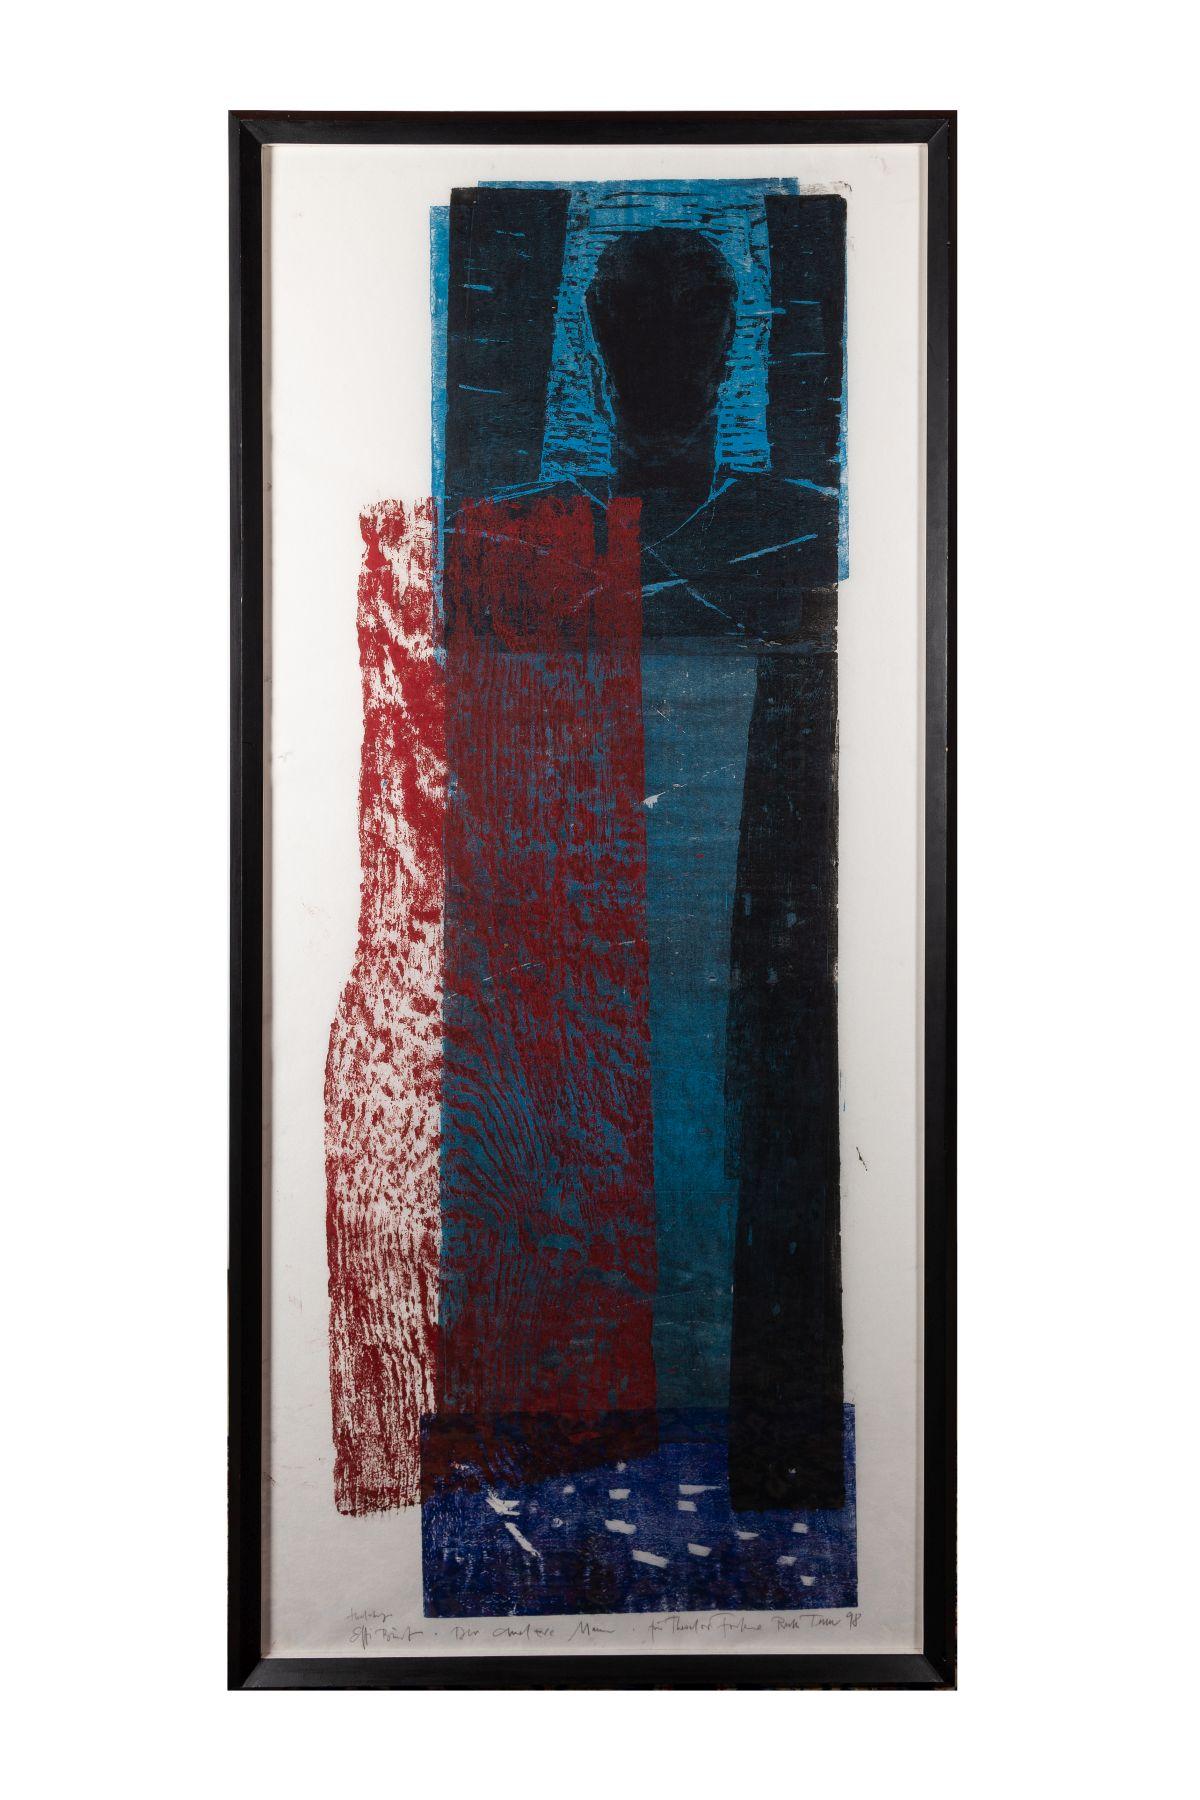 #46 Ruth Tesmar (born 1951), Effi Briest, color woodcut, 1998 | Ruth Tesmar (geb. 1951), Effi Briest, Farbholzschnitt, 1998 Image